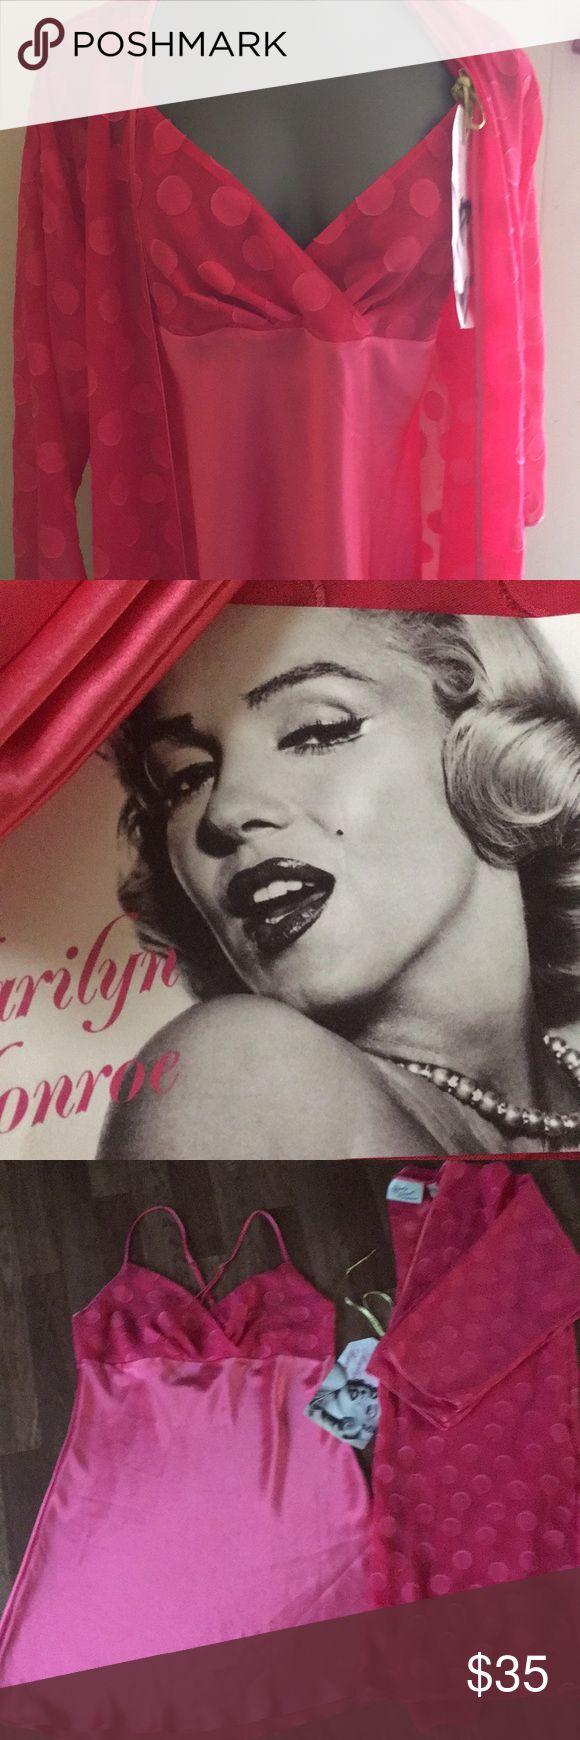 """NWT""Marilyn Monroe's Pink Polka-dot Nighty Sz. SP ""NWT"" Marilyn Monroe Pink Polka-dot Nighty (Gown/lingerie) Sz. Small/Petite Marilyn Monroe by Warner Intimates & Sleepwear"